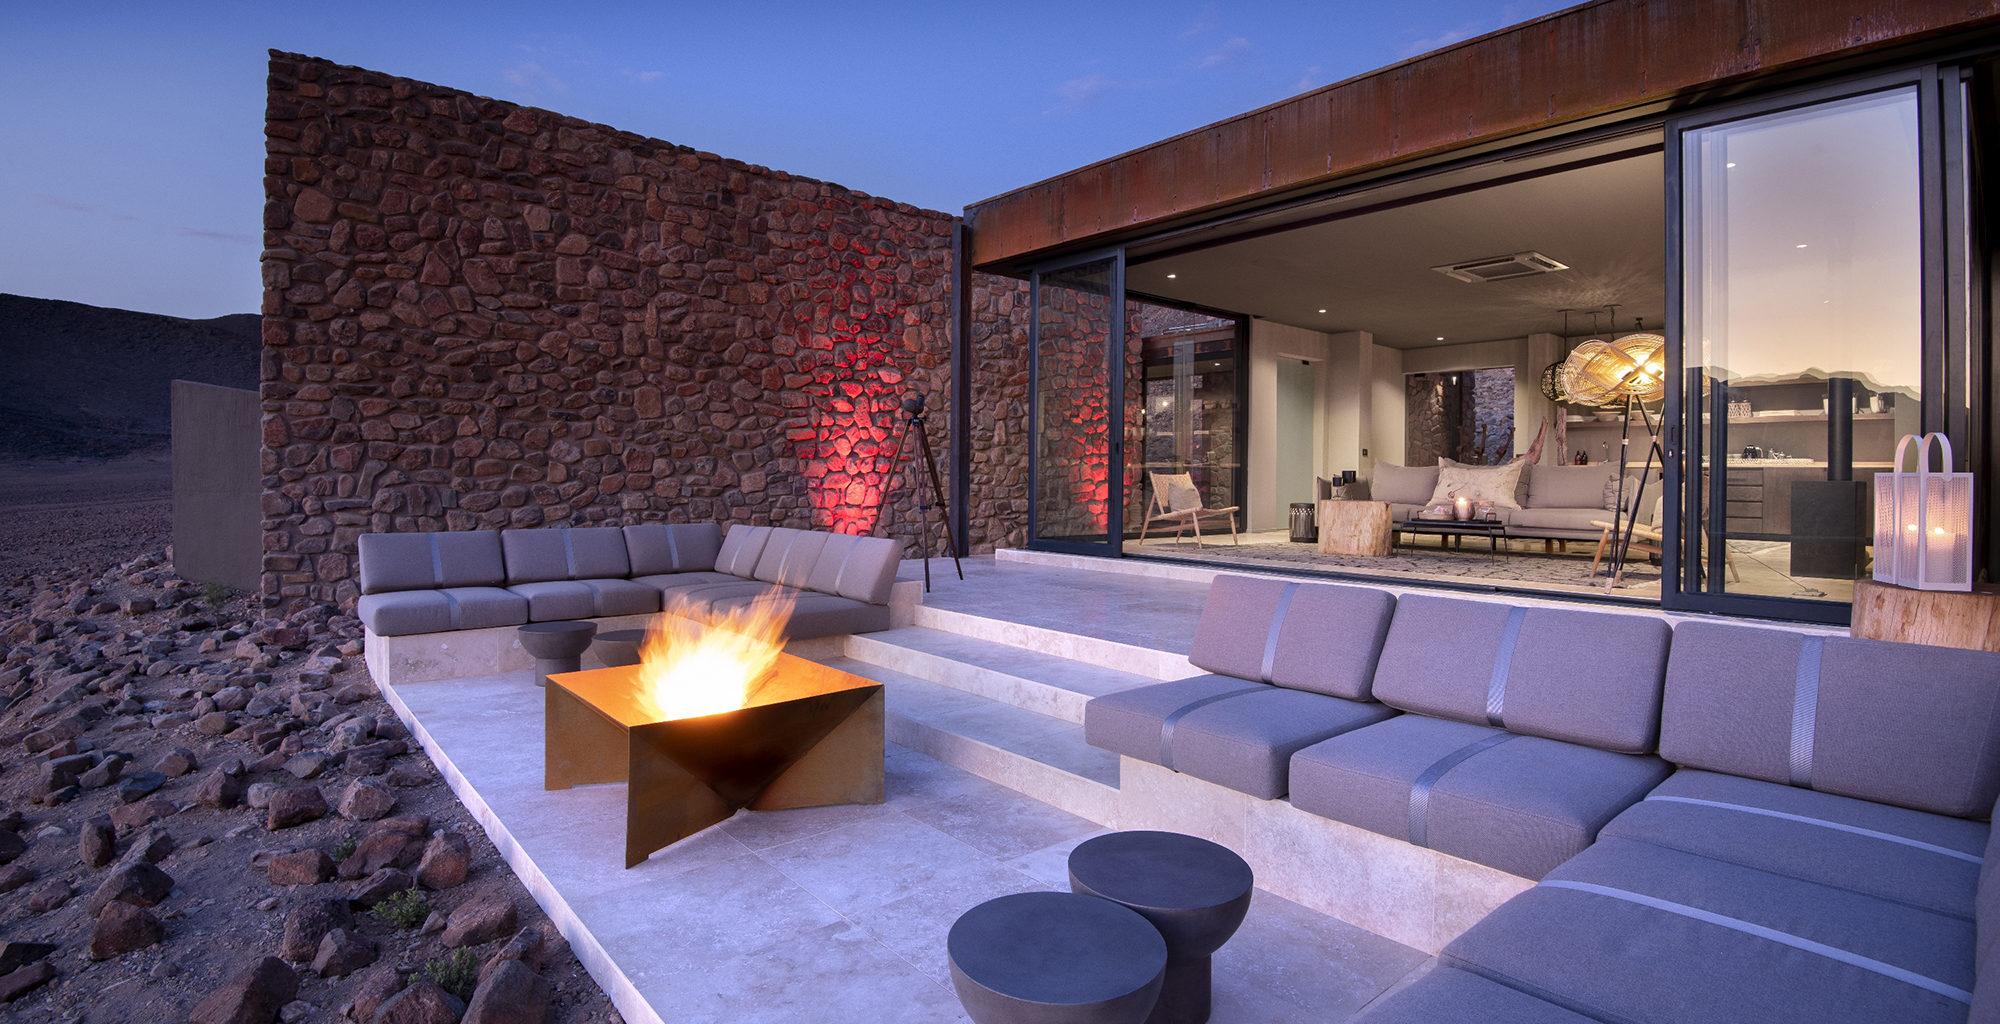 Namibia-Sossusvlei-Desert-Lodge-Outdoor-Lounge